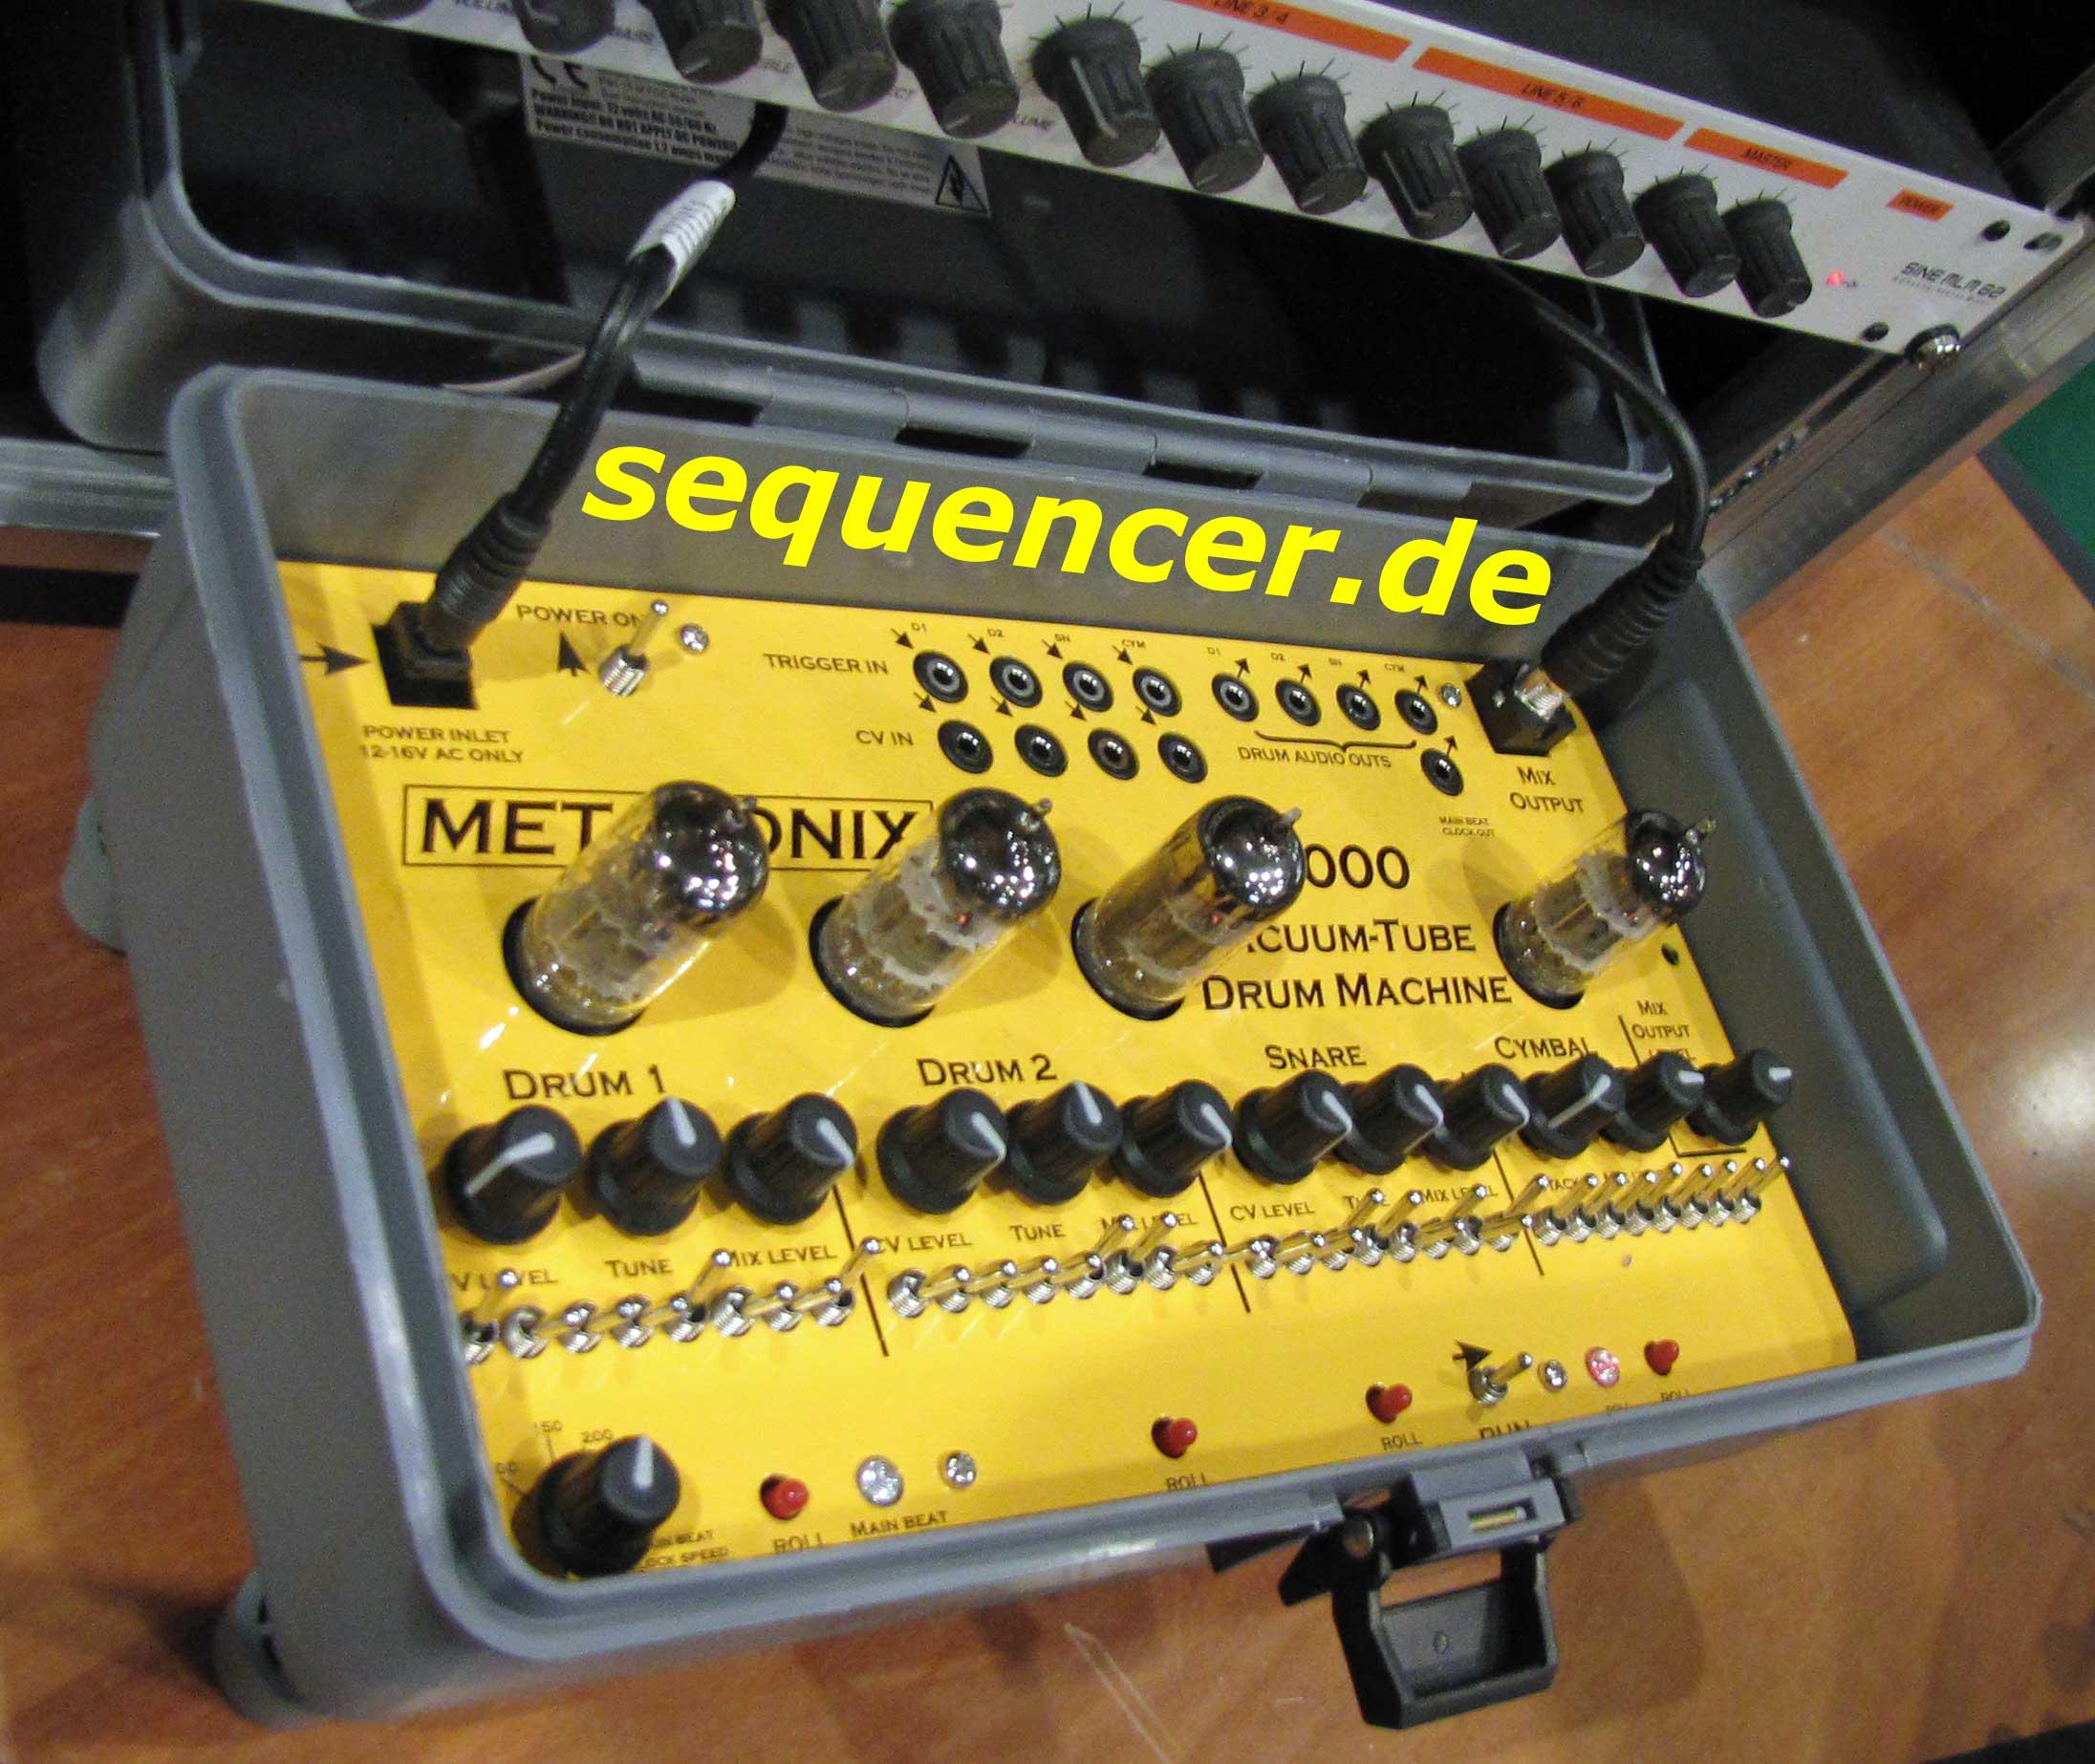 metasonix d1000 vacuum tube drum machine drummachine module step sequencer. Black Bedroom Furniture Sets. Home Design Ideas